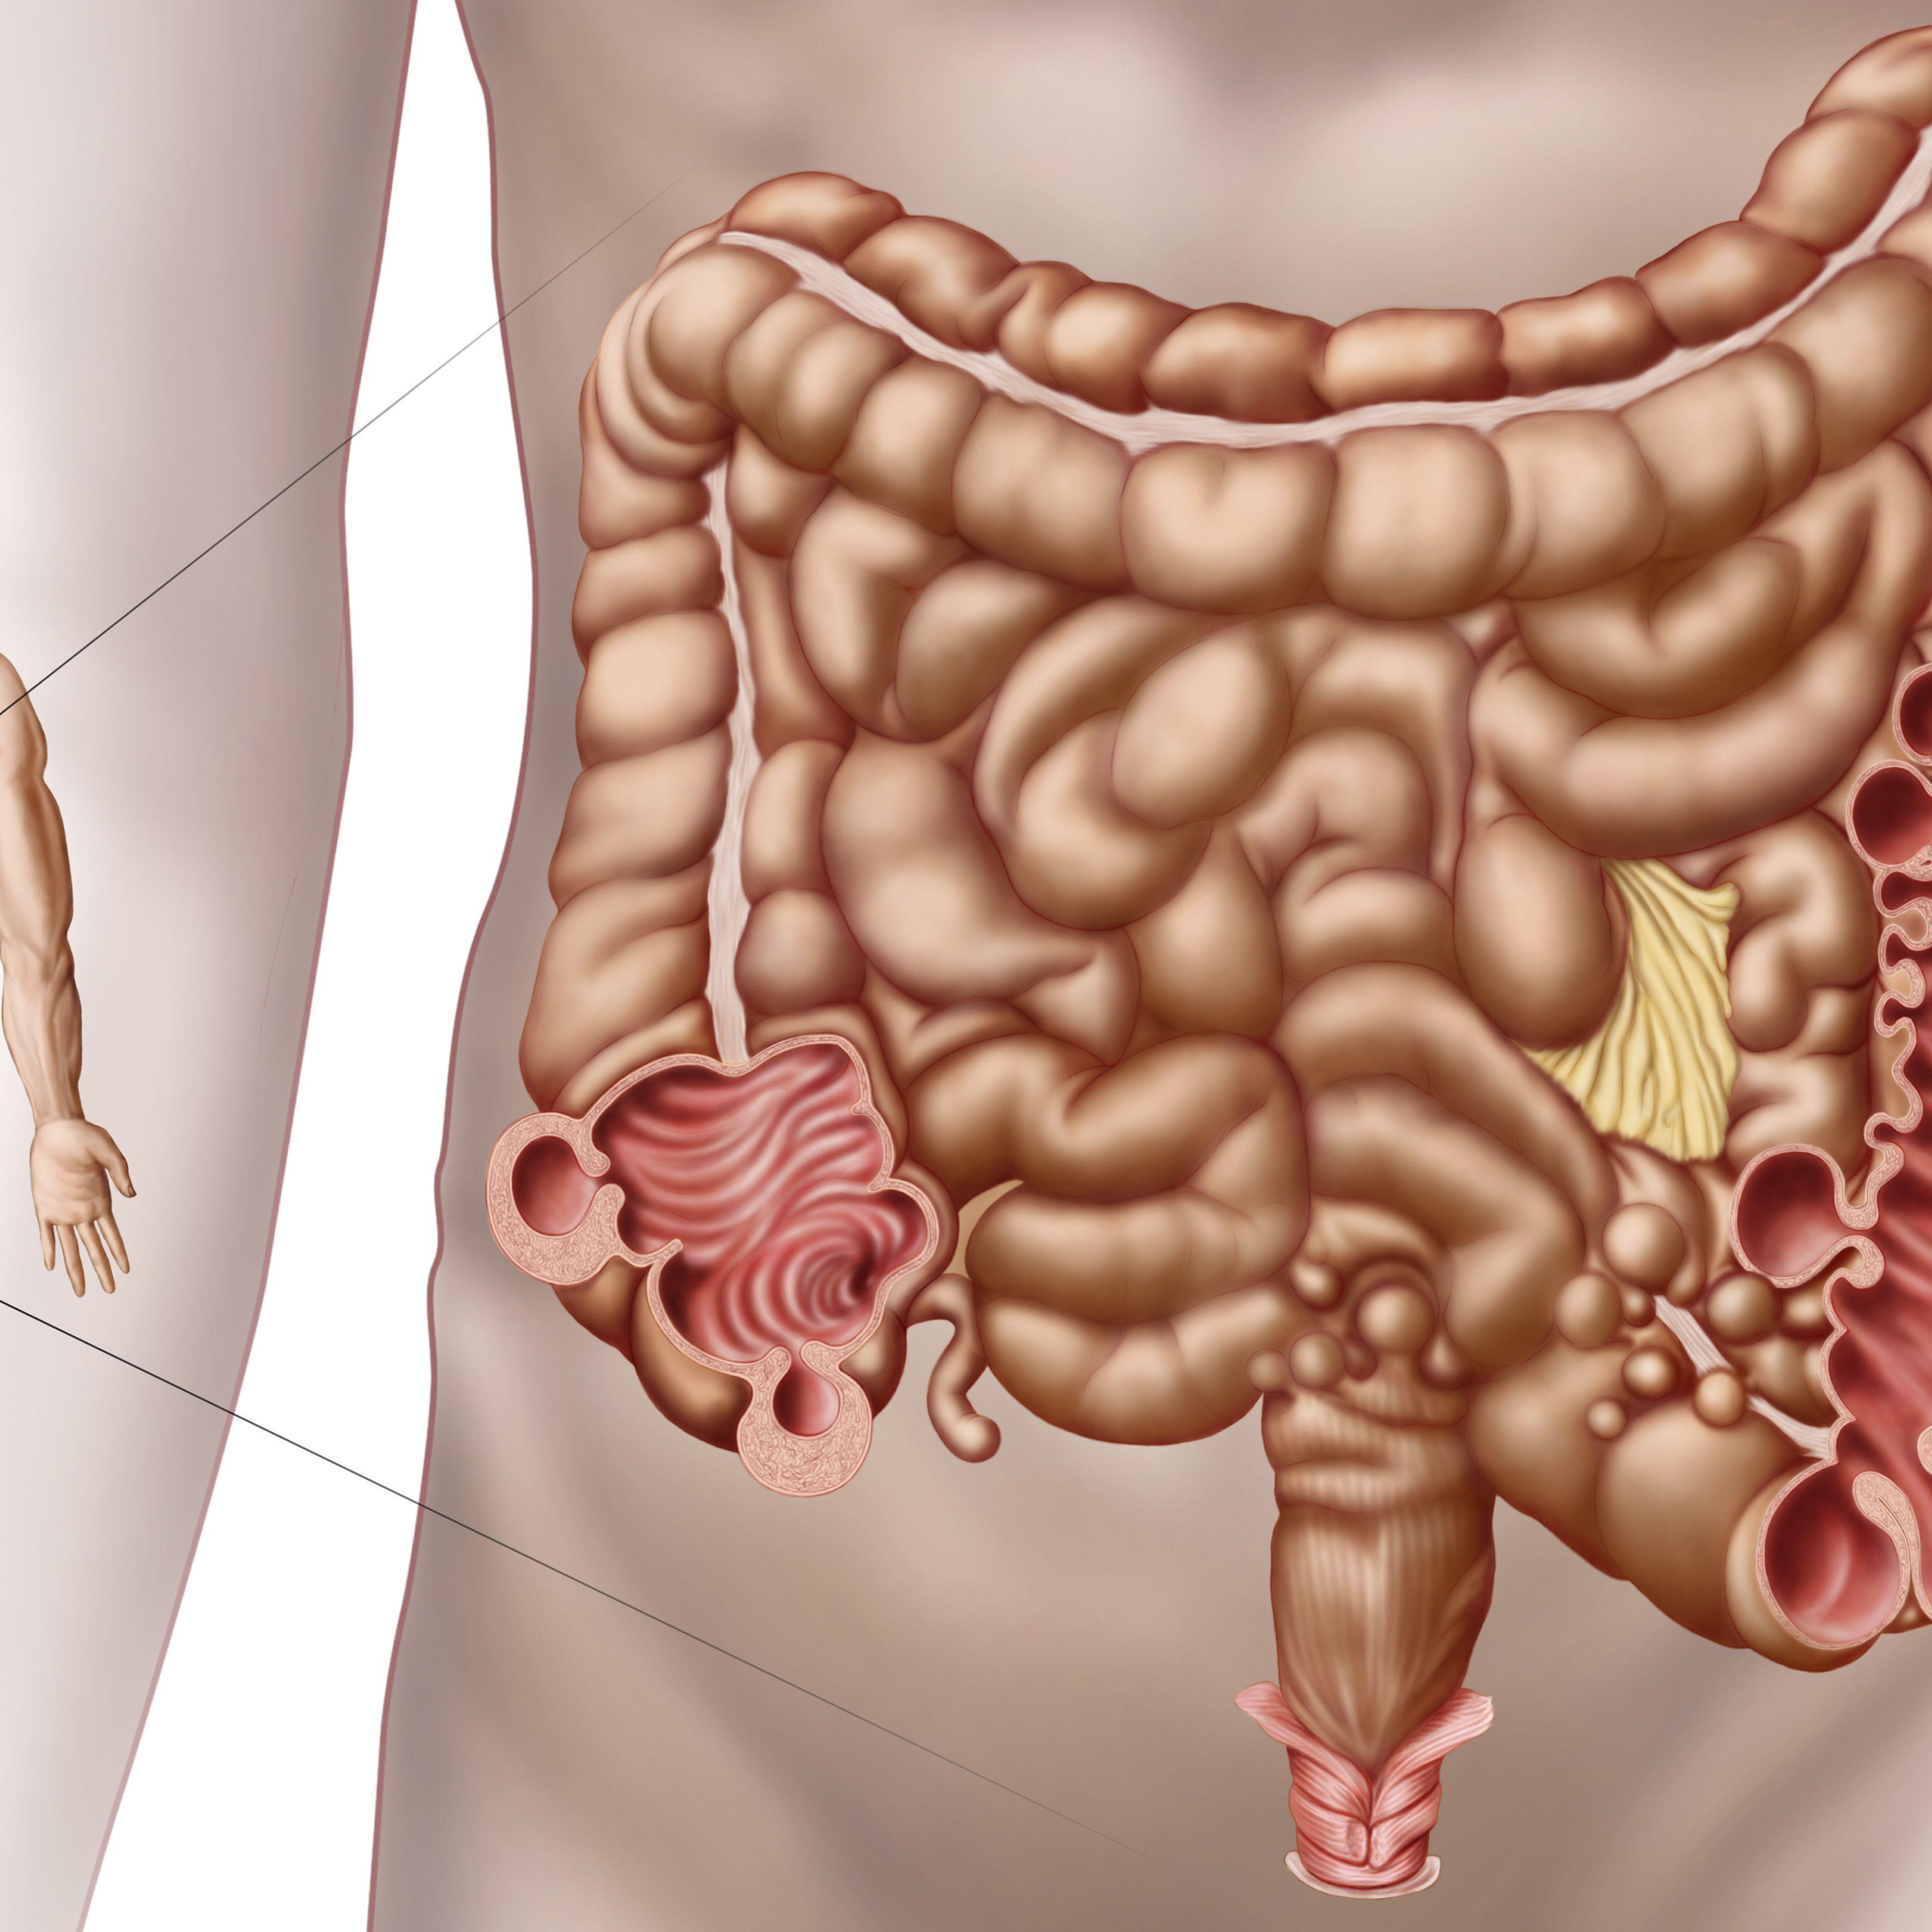 Diverticulitis: Symptoms, Causes, Diagnosis, Treatment